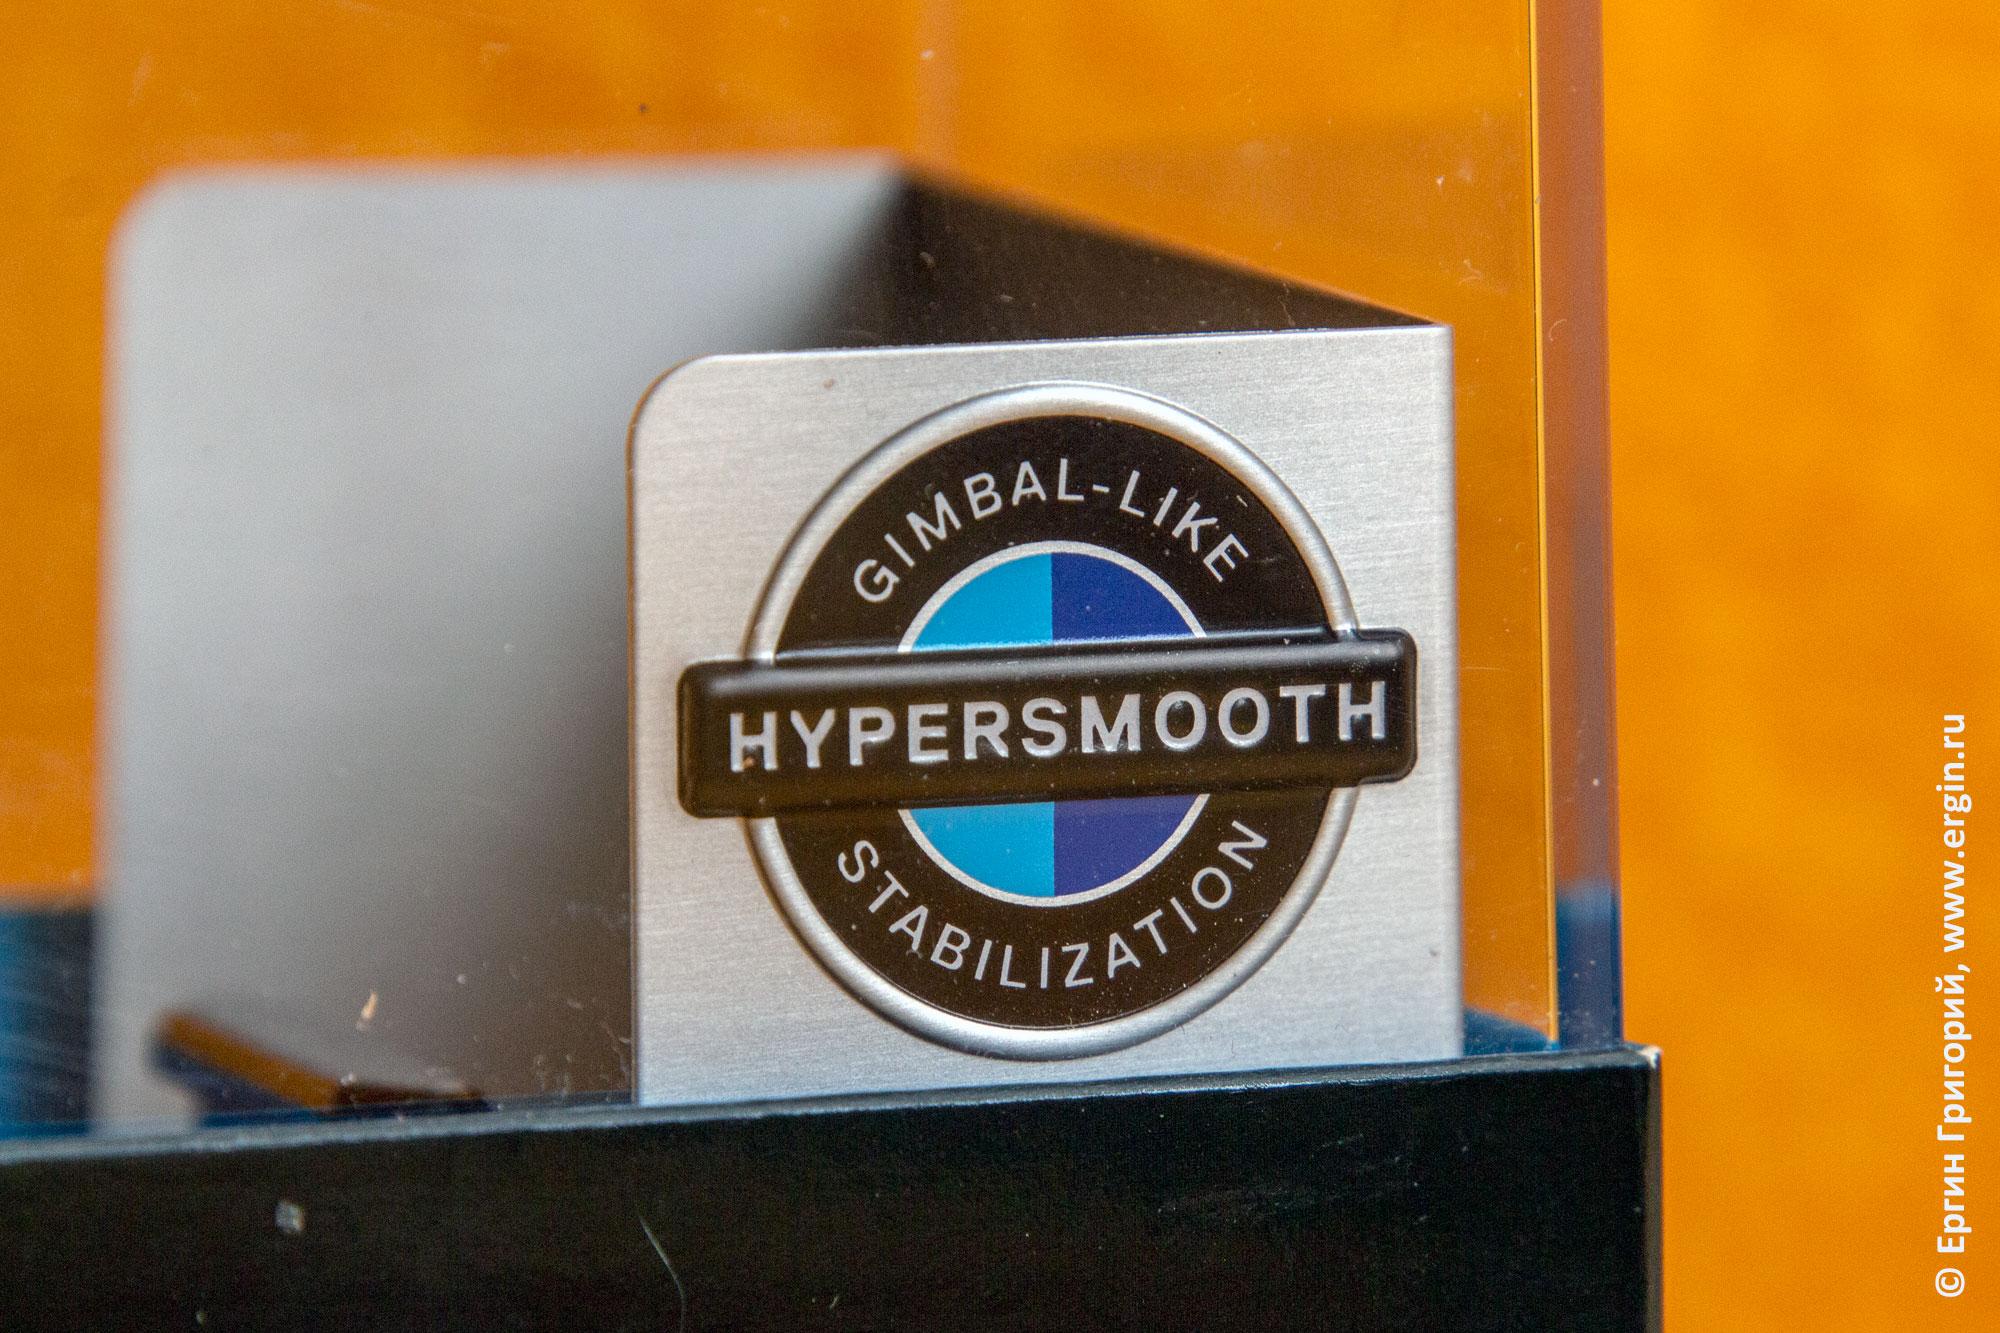 GoPro Hypersmooth замена подвесу стедикаму для экшн-камеры